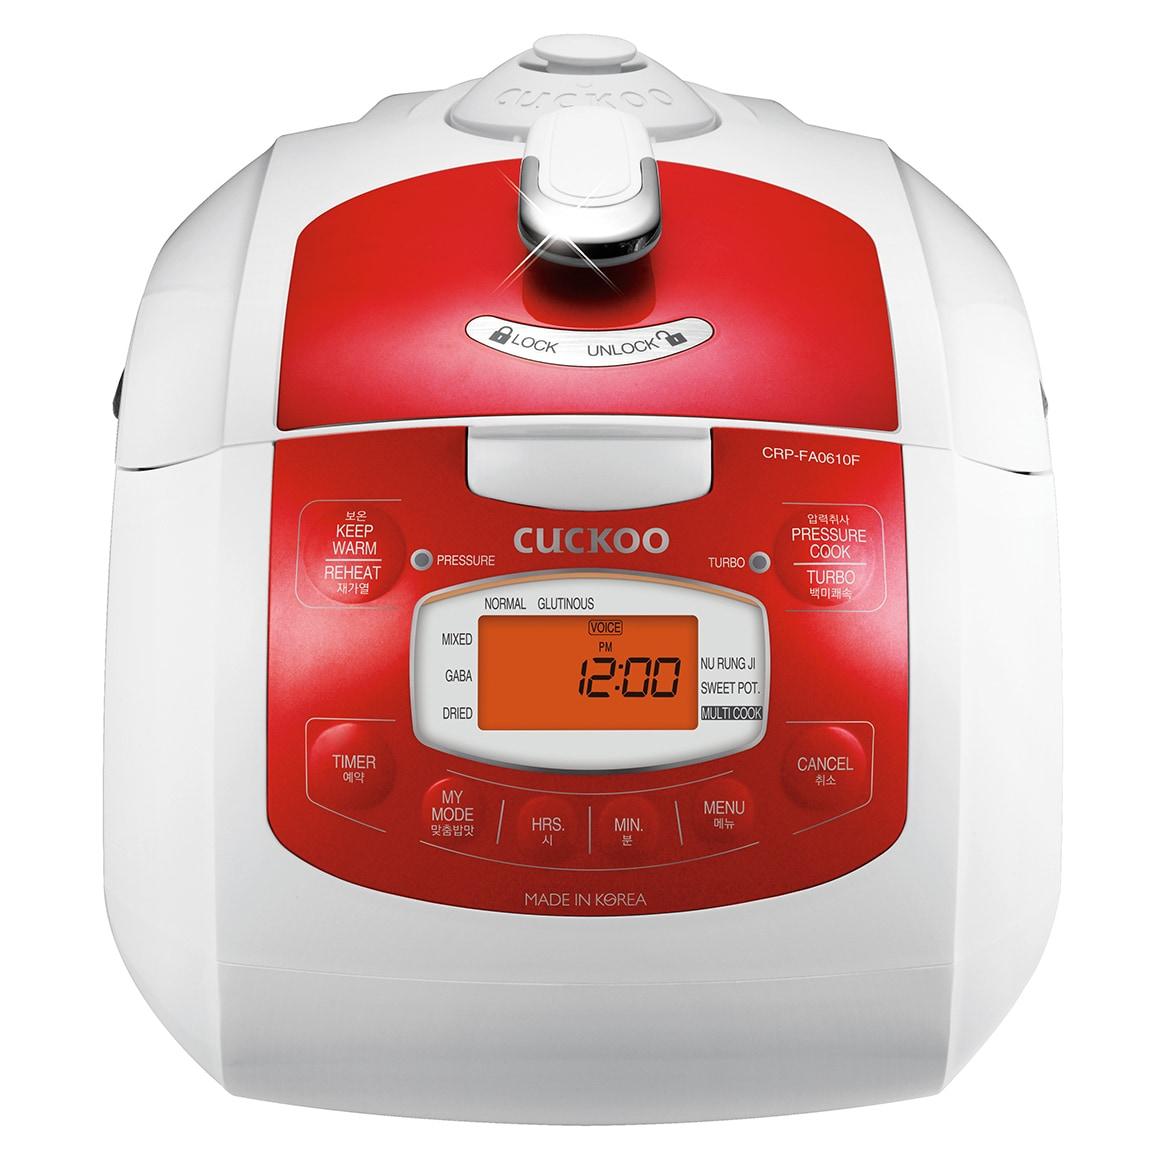 Cuckoo Electric Pressure Rice Cooker CRP-FA0610FR (6 Cups...